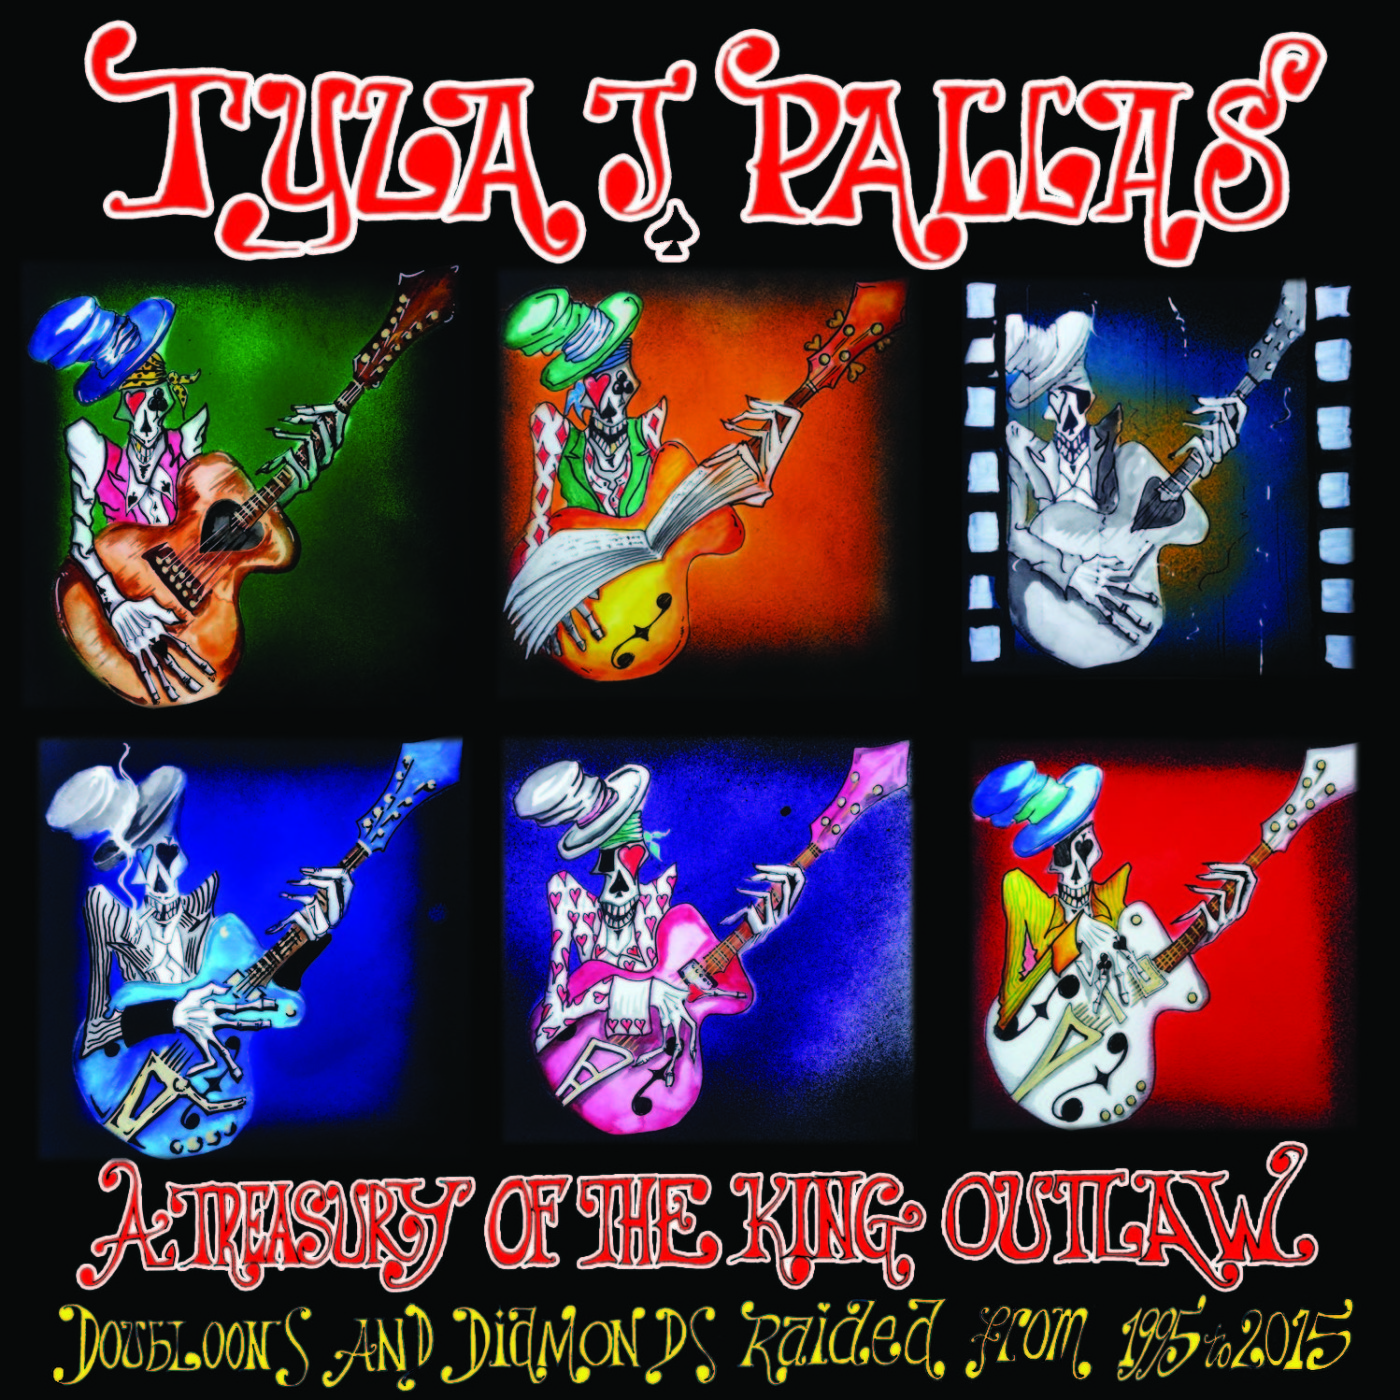 Tyla J. Pallas The Chard Urton Blues Treasury Vol 3